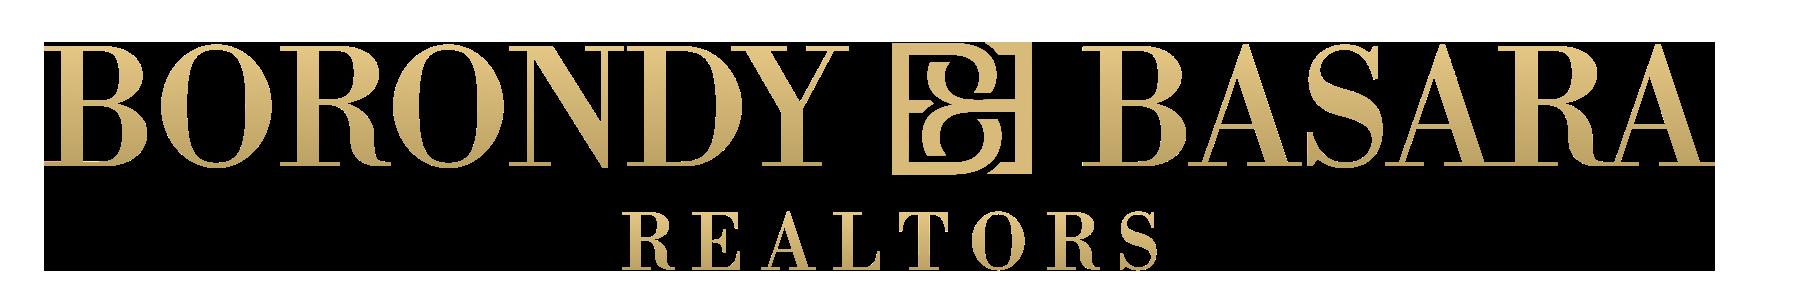 BorondyBasara logo